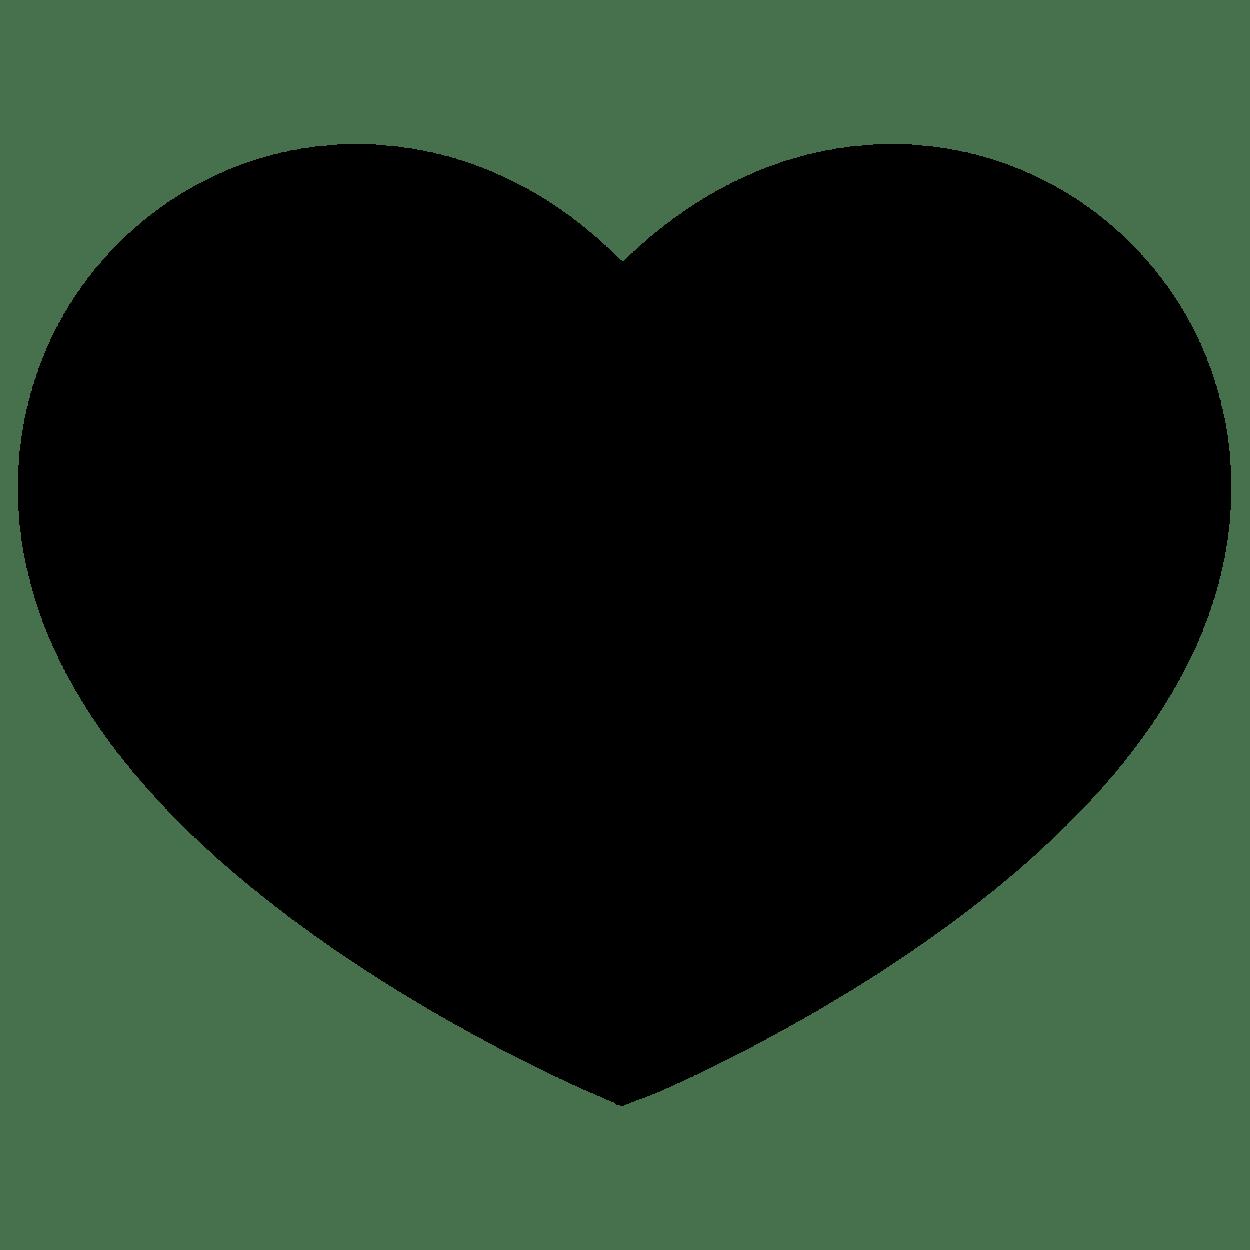 Black Heart Transparent Image